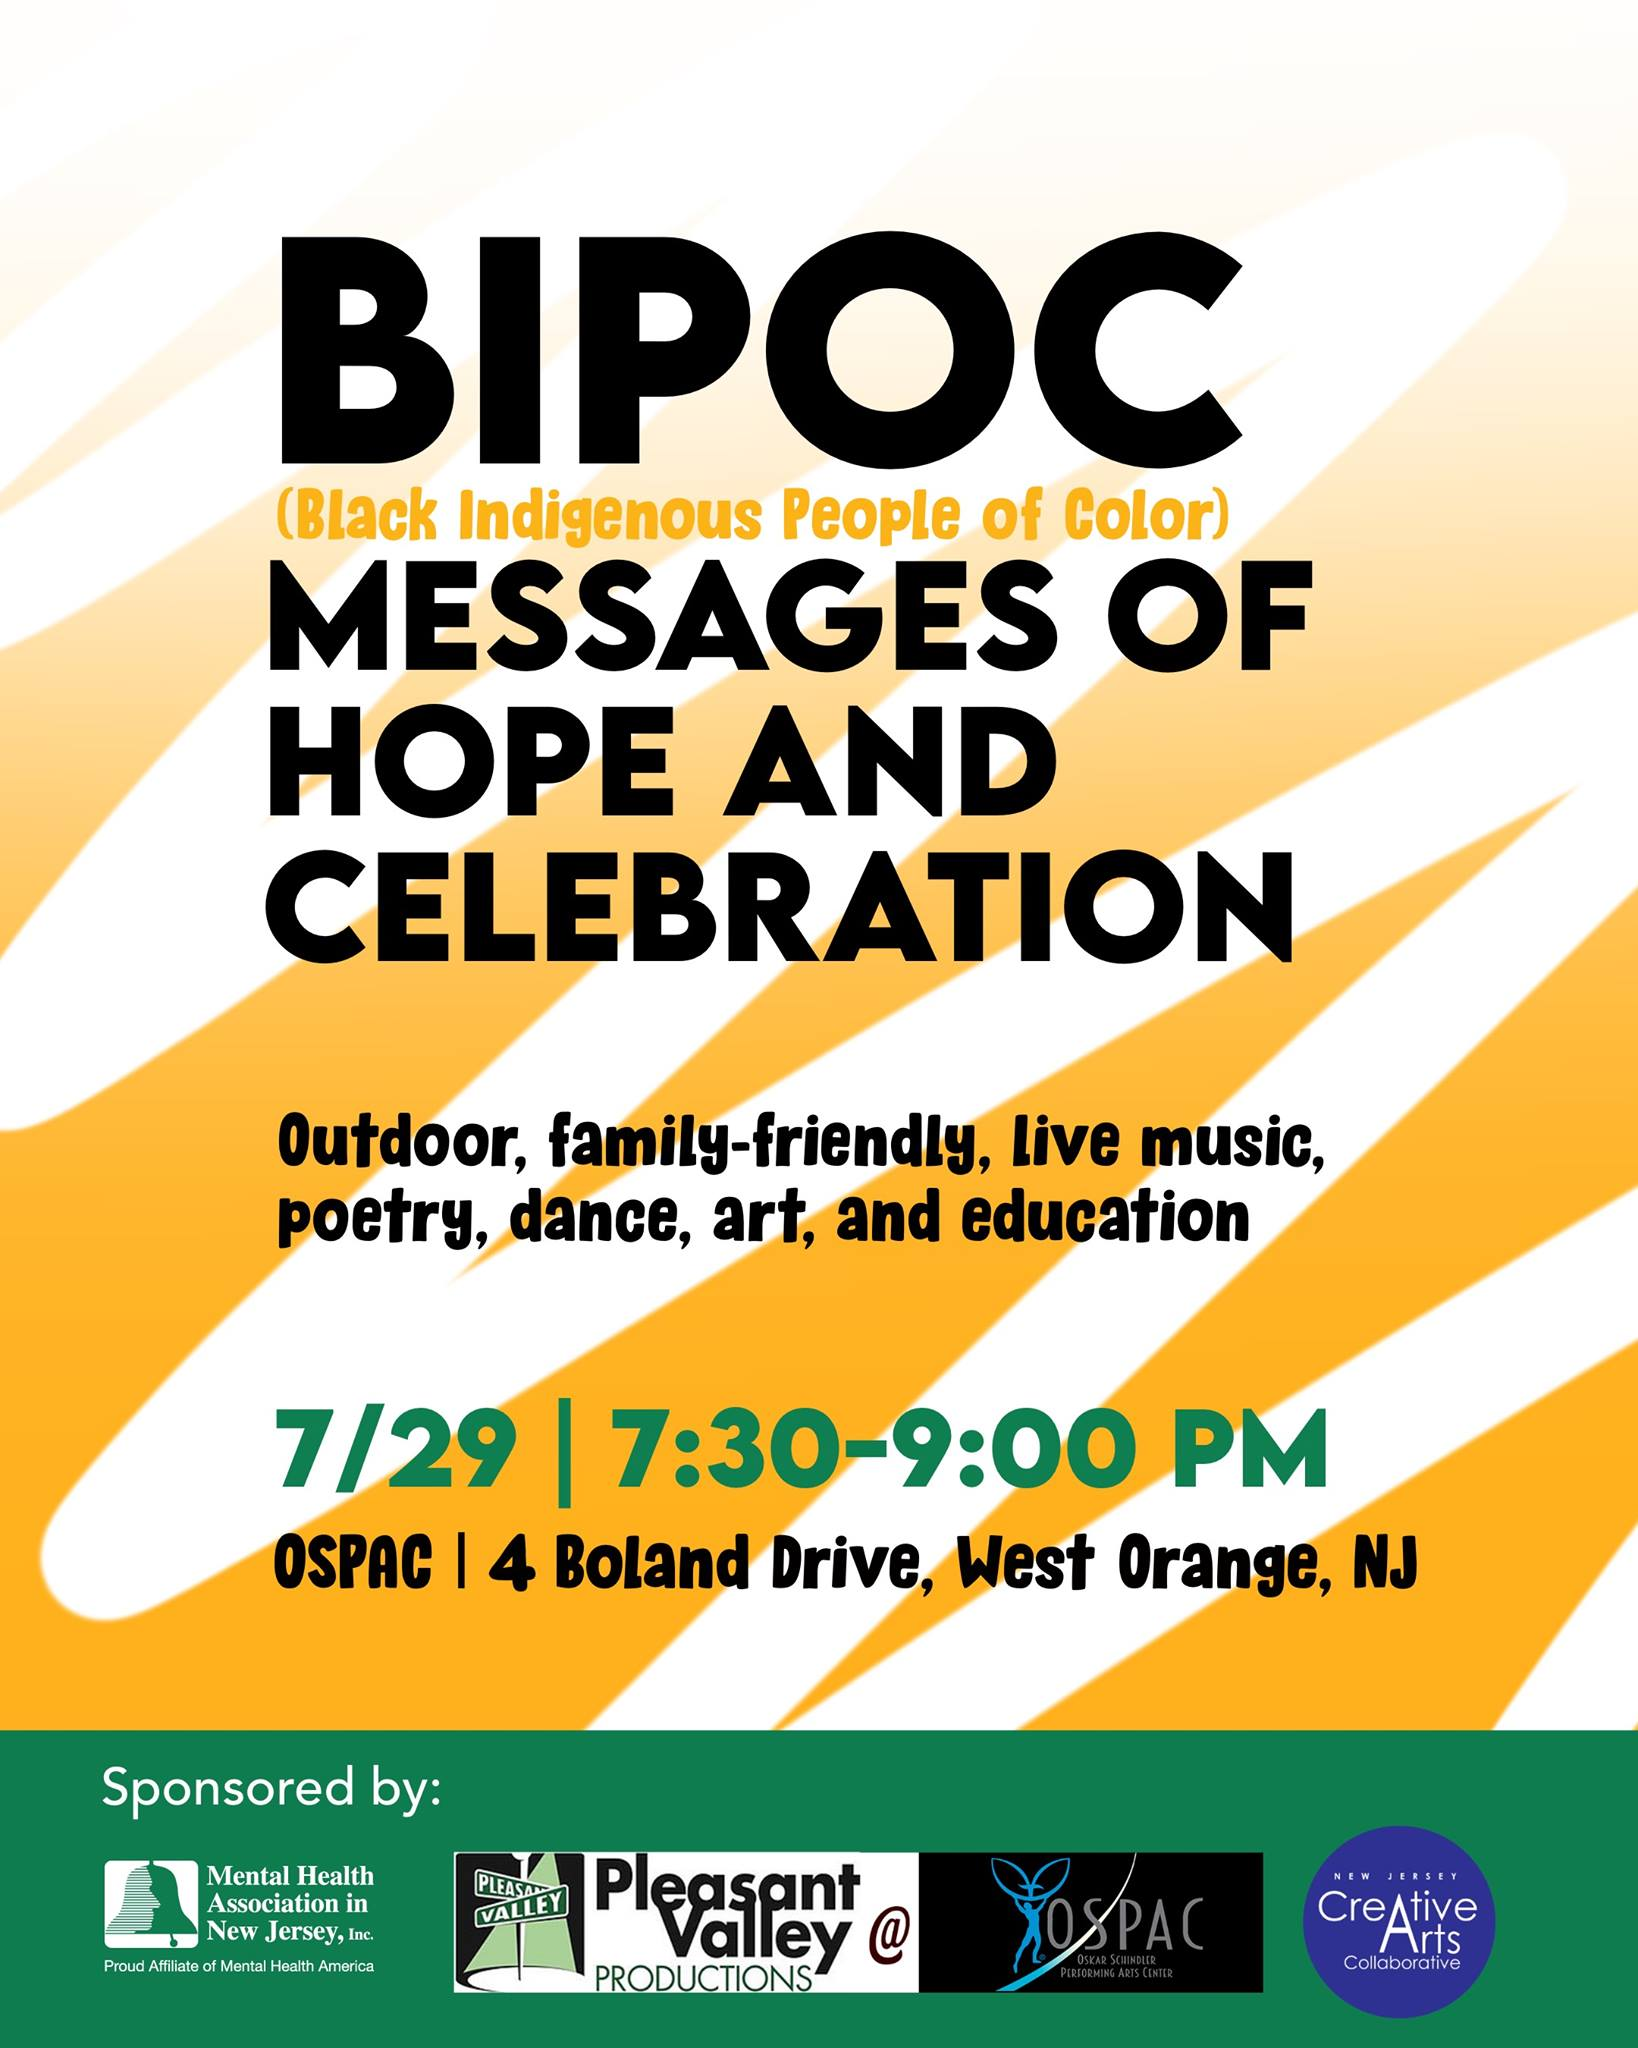 BIPOC at OSPAC